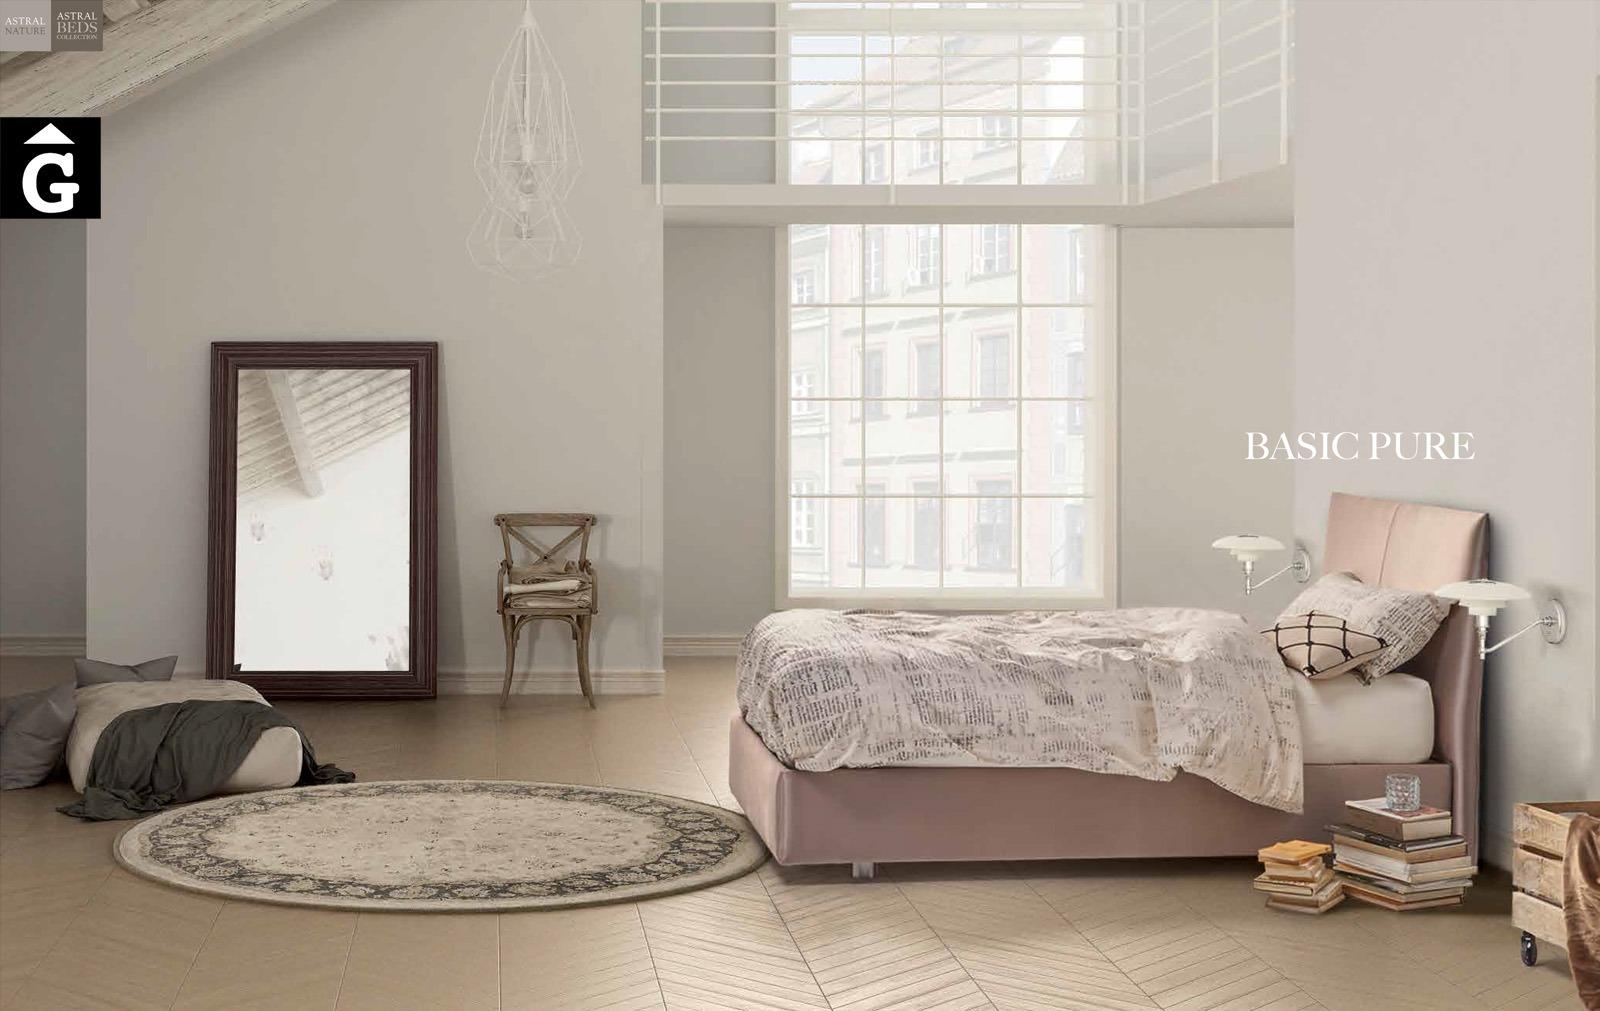 Basic Pure llit entapissat Beds Astral Nature descans qualitat natural i salut junts per mobles Gifreu